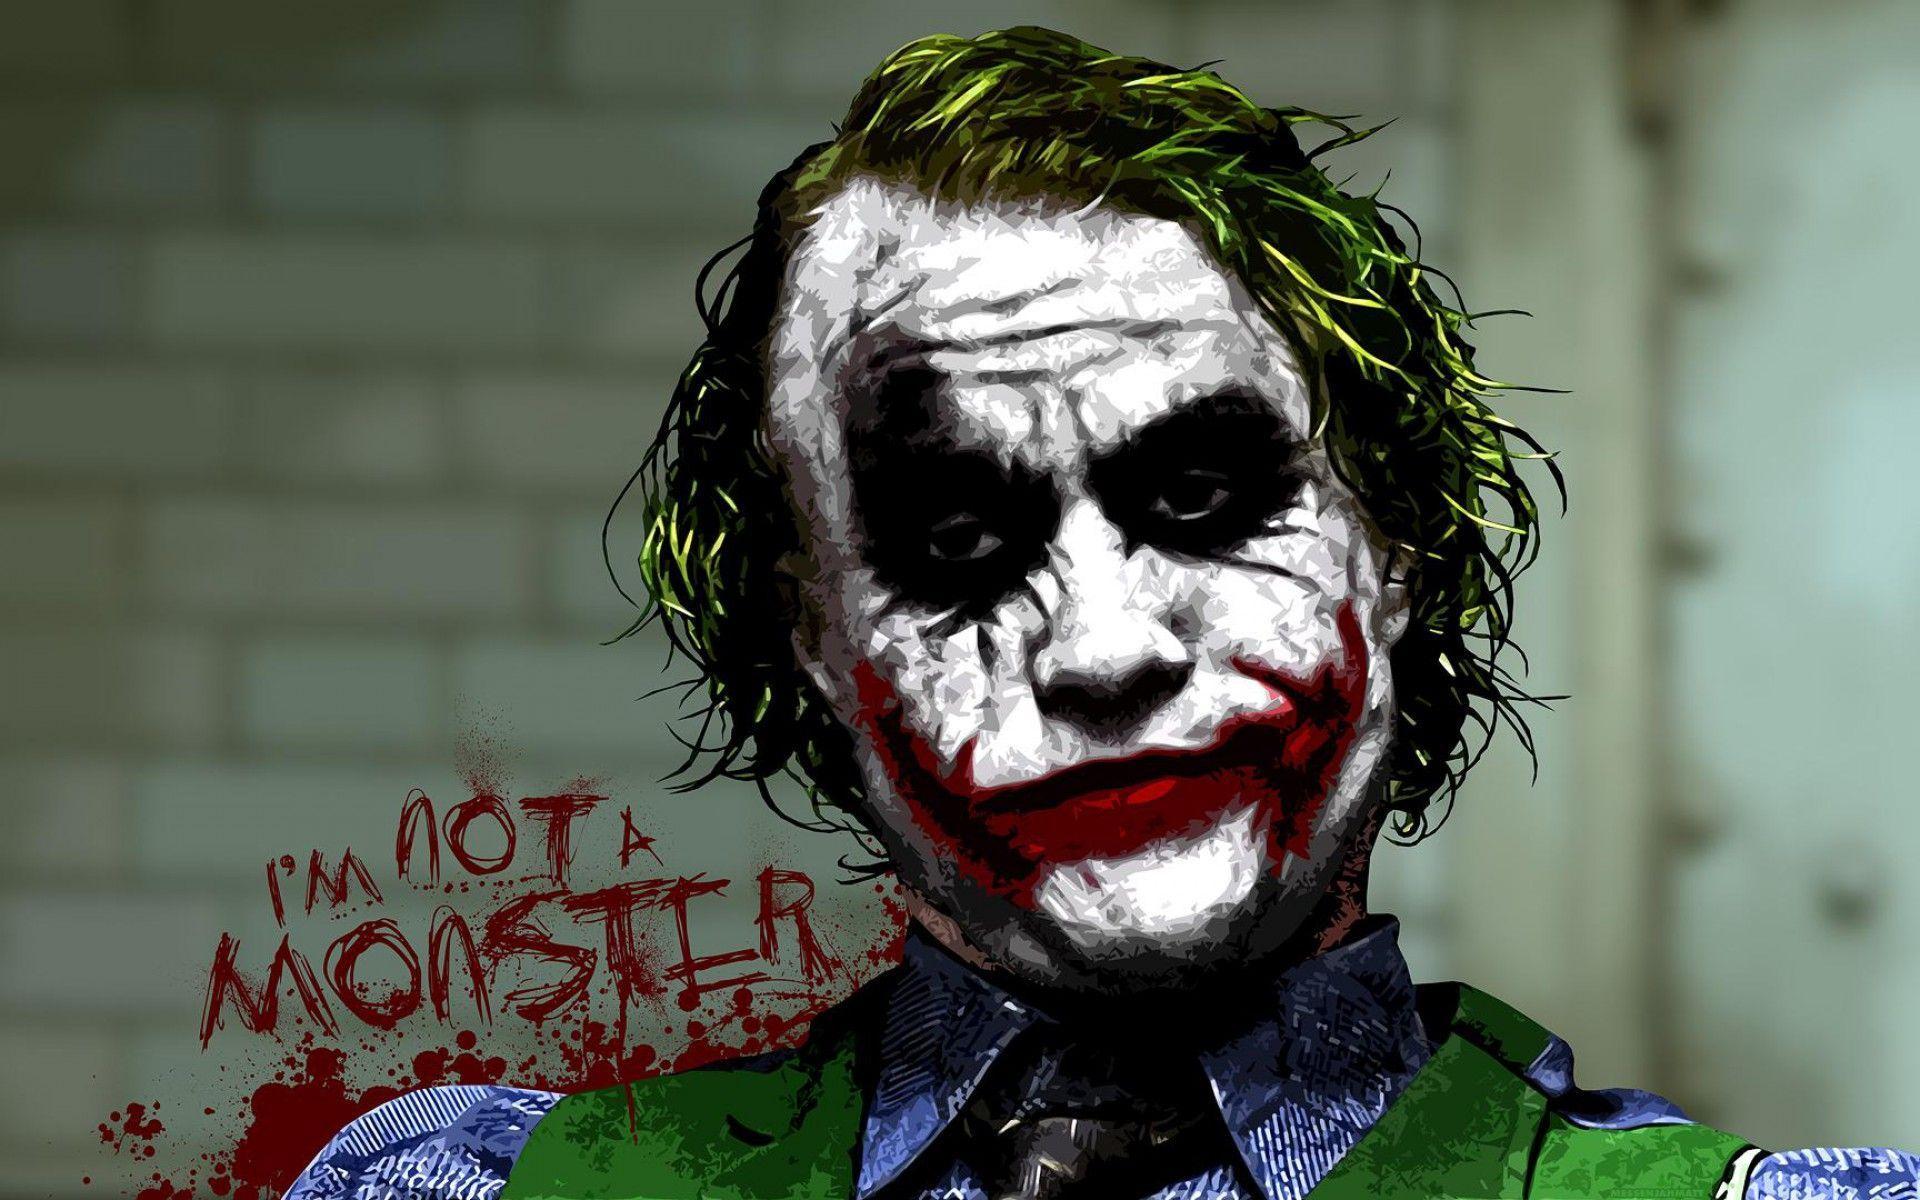 Batman And Joker Wallpapers Wallpaper Cave